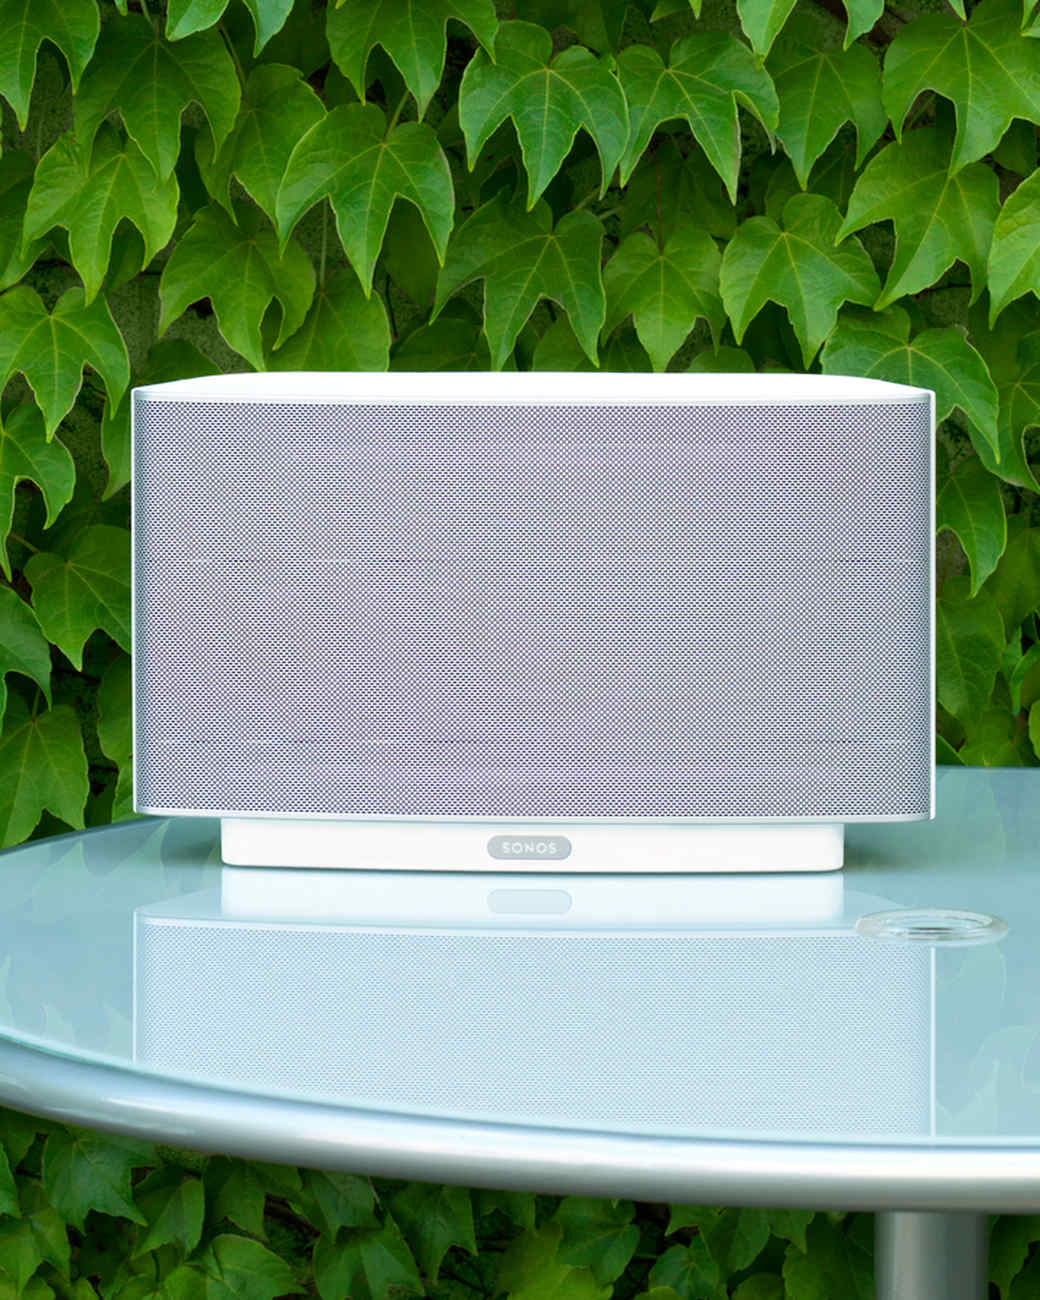 sonos-play5-wireless-speaker-system.jpg